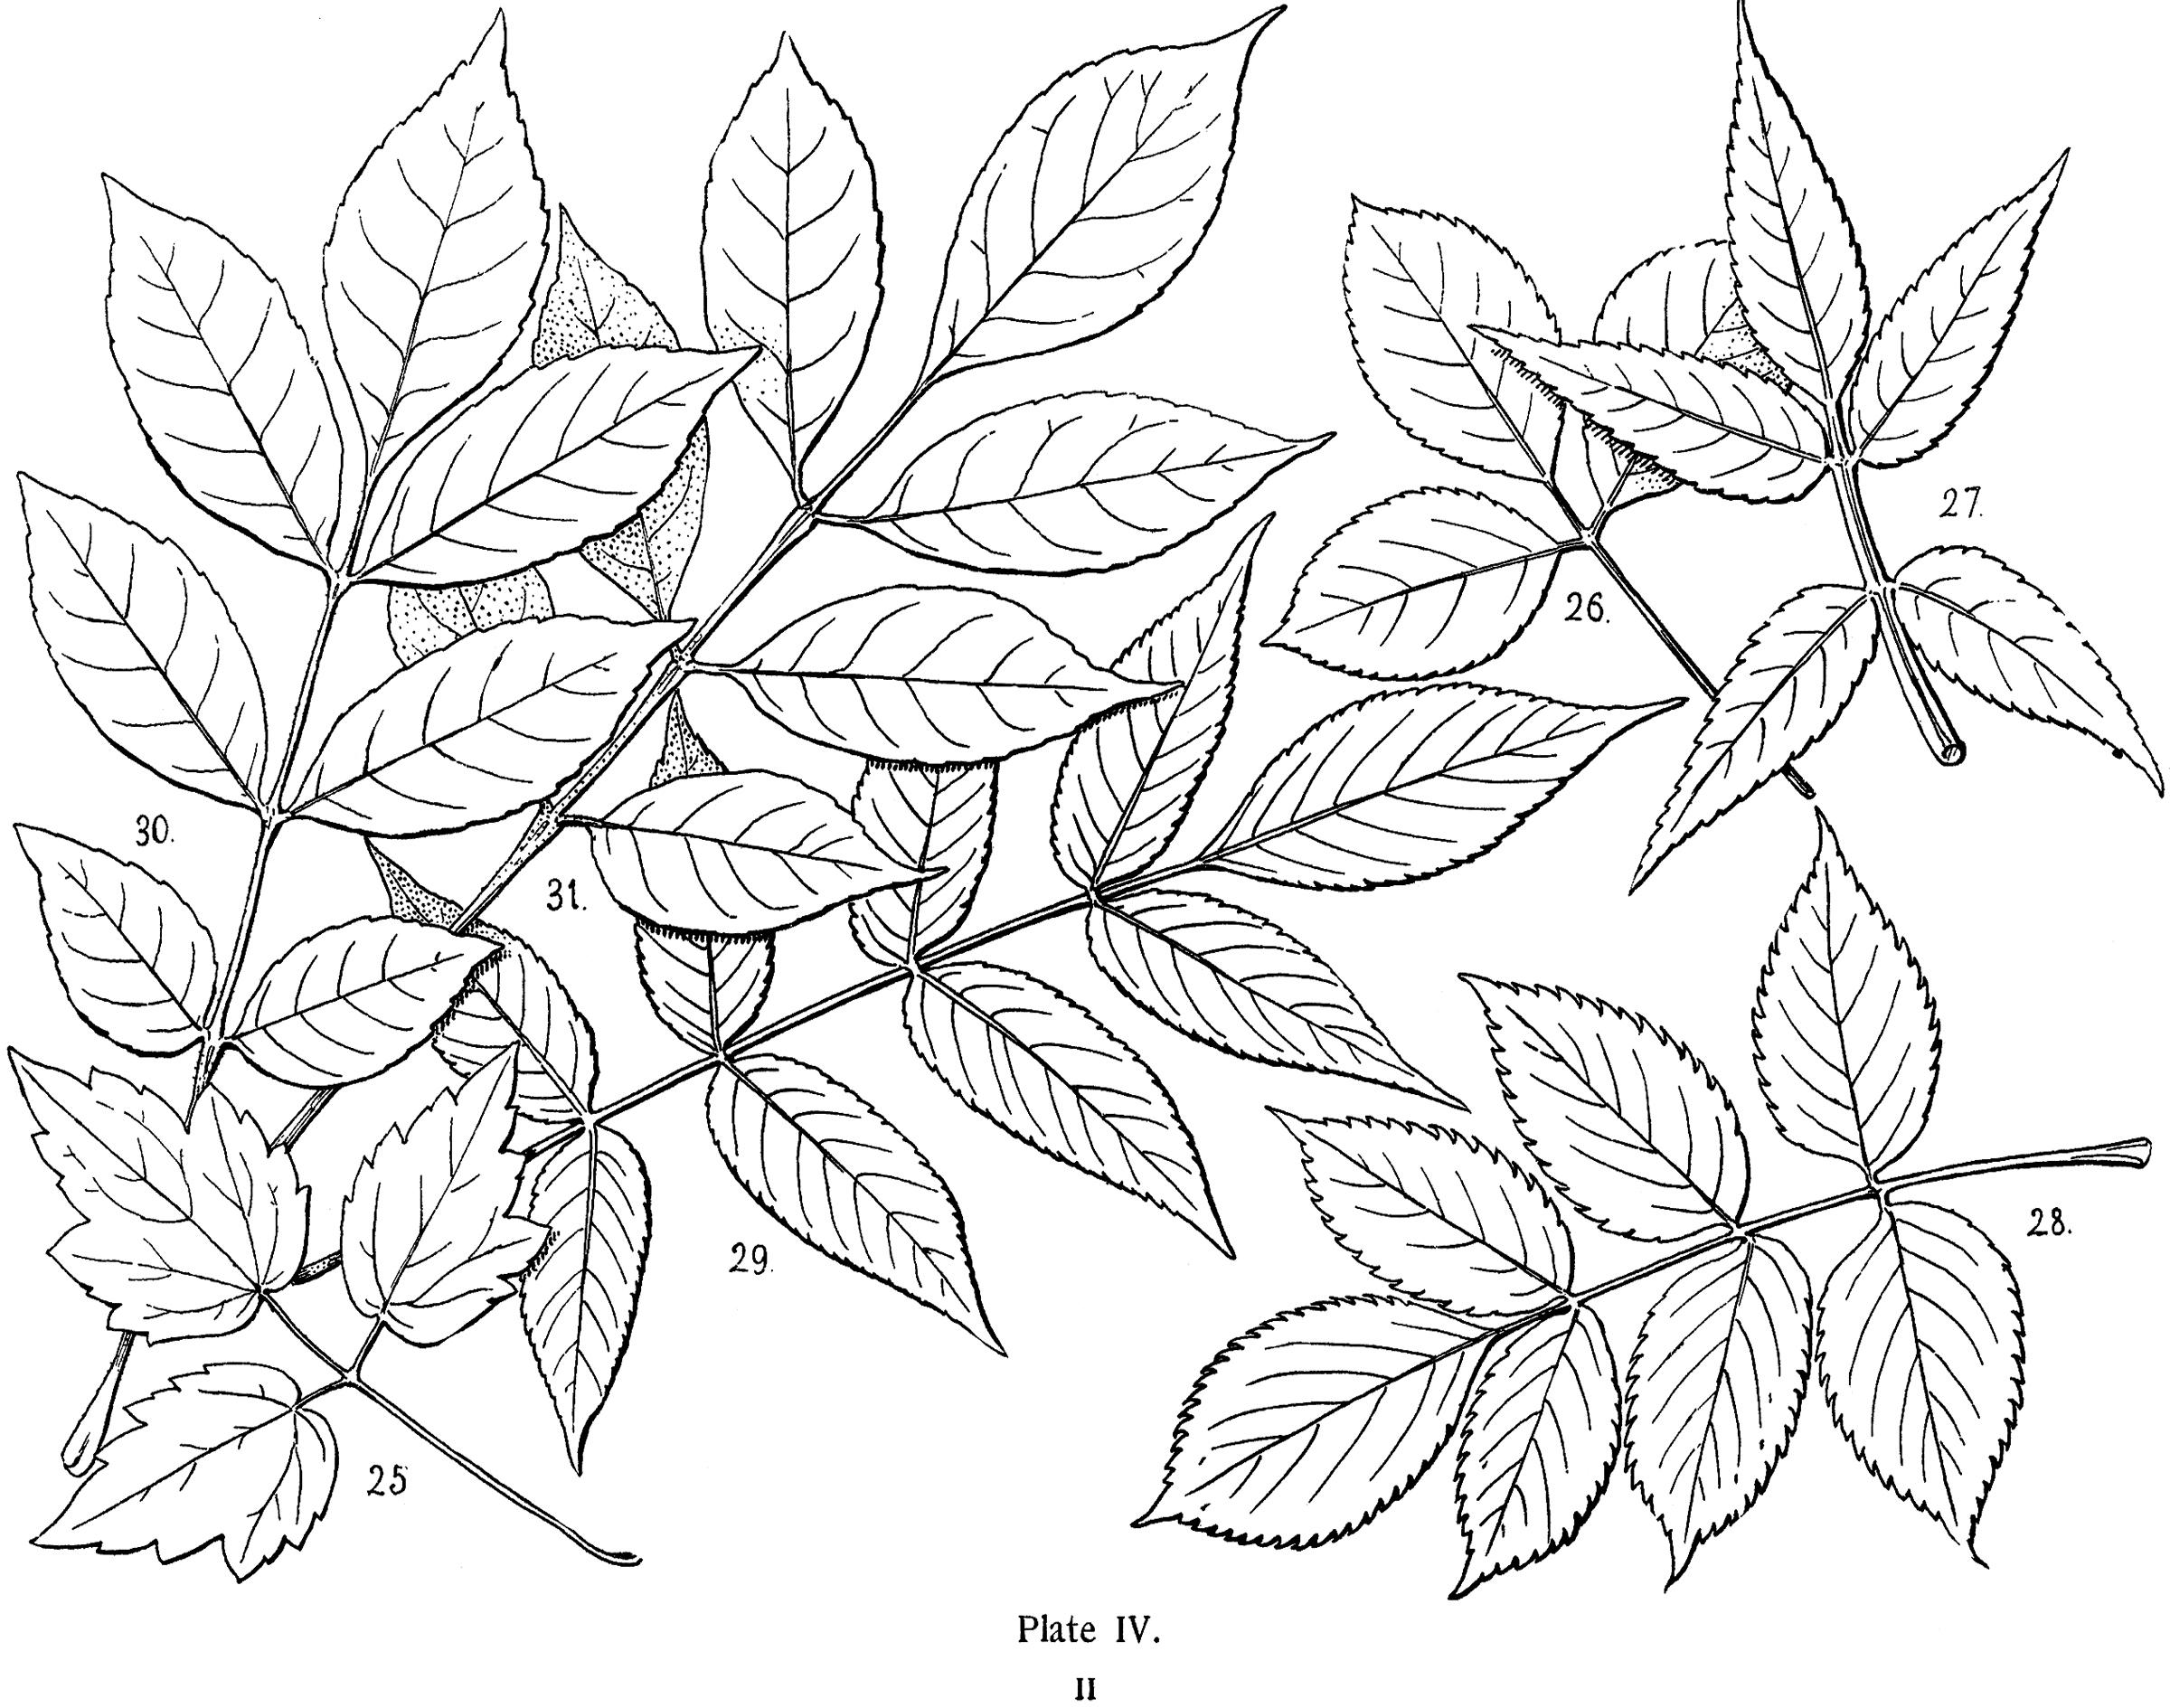 patrick whites a fringe of leaves essay Find great deals for a fringe of leaves by patrick white (paperback, 2010) shop with confidence on ebay.